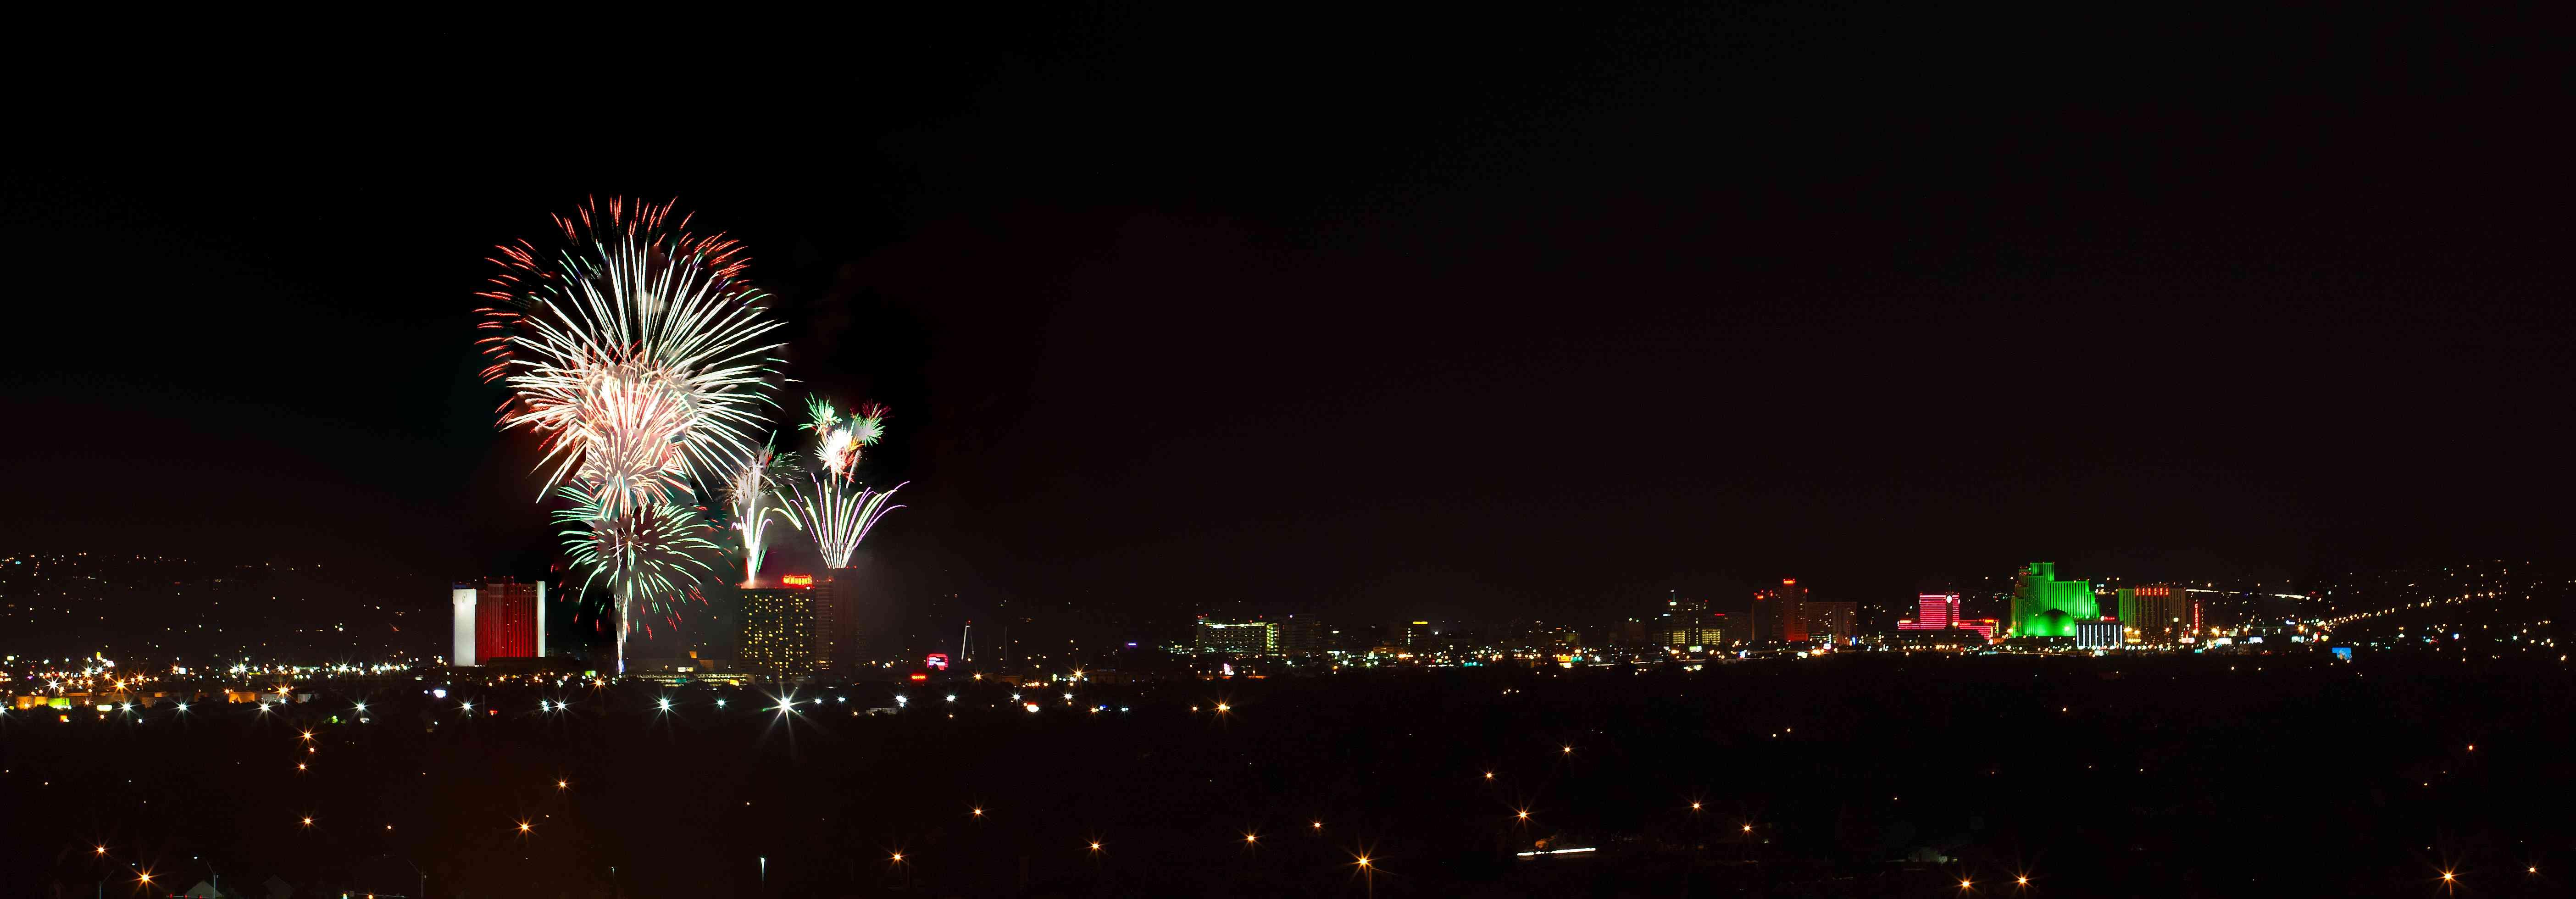 Fireworks over Reno, Nevada